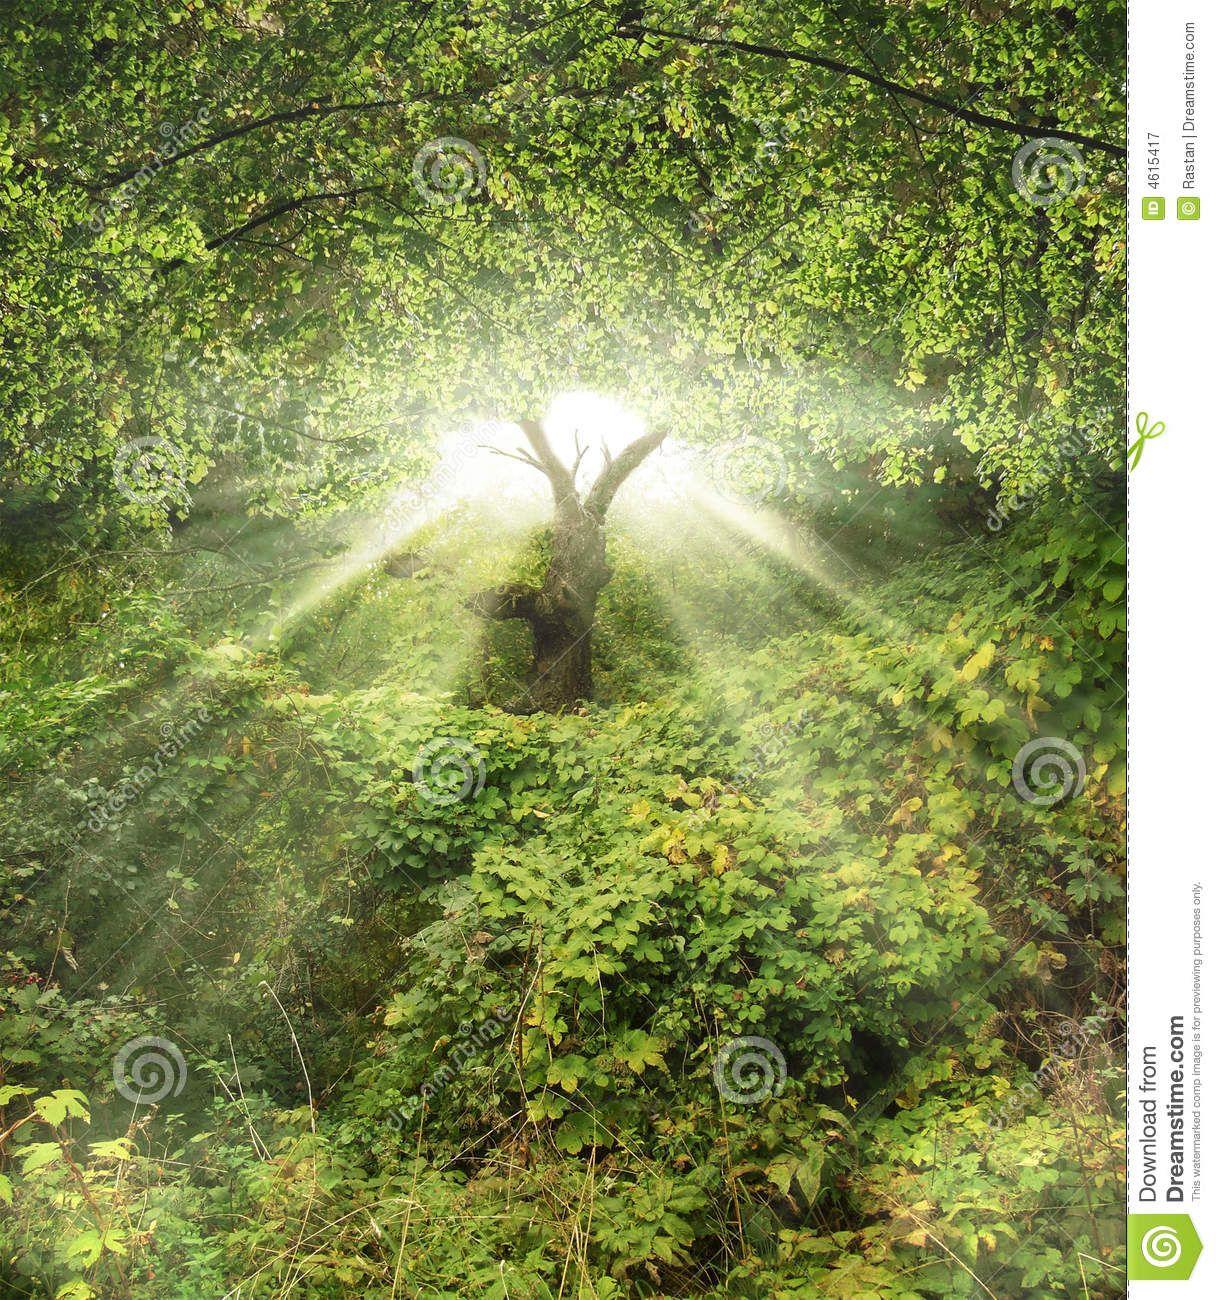 Garden Of Eden Landscape: Images Of The Garden Of Eden